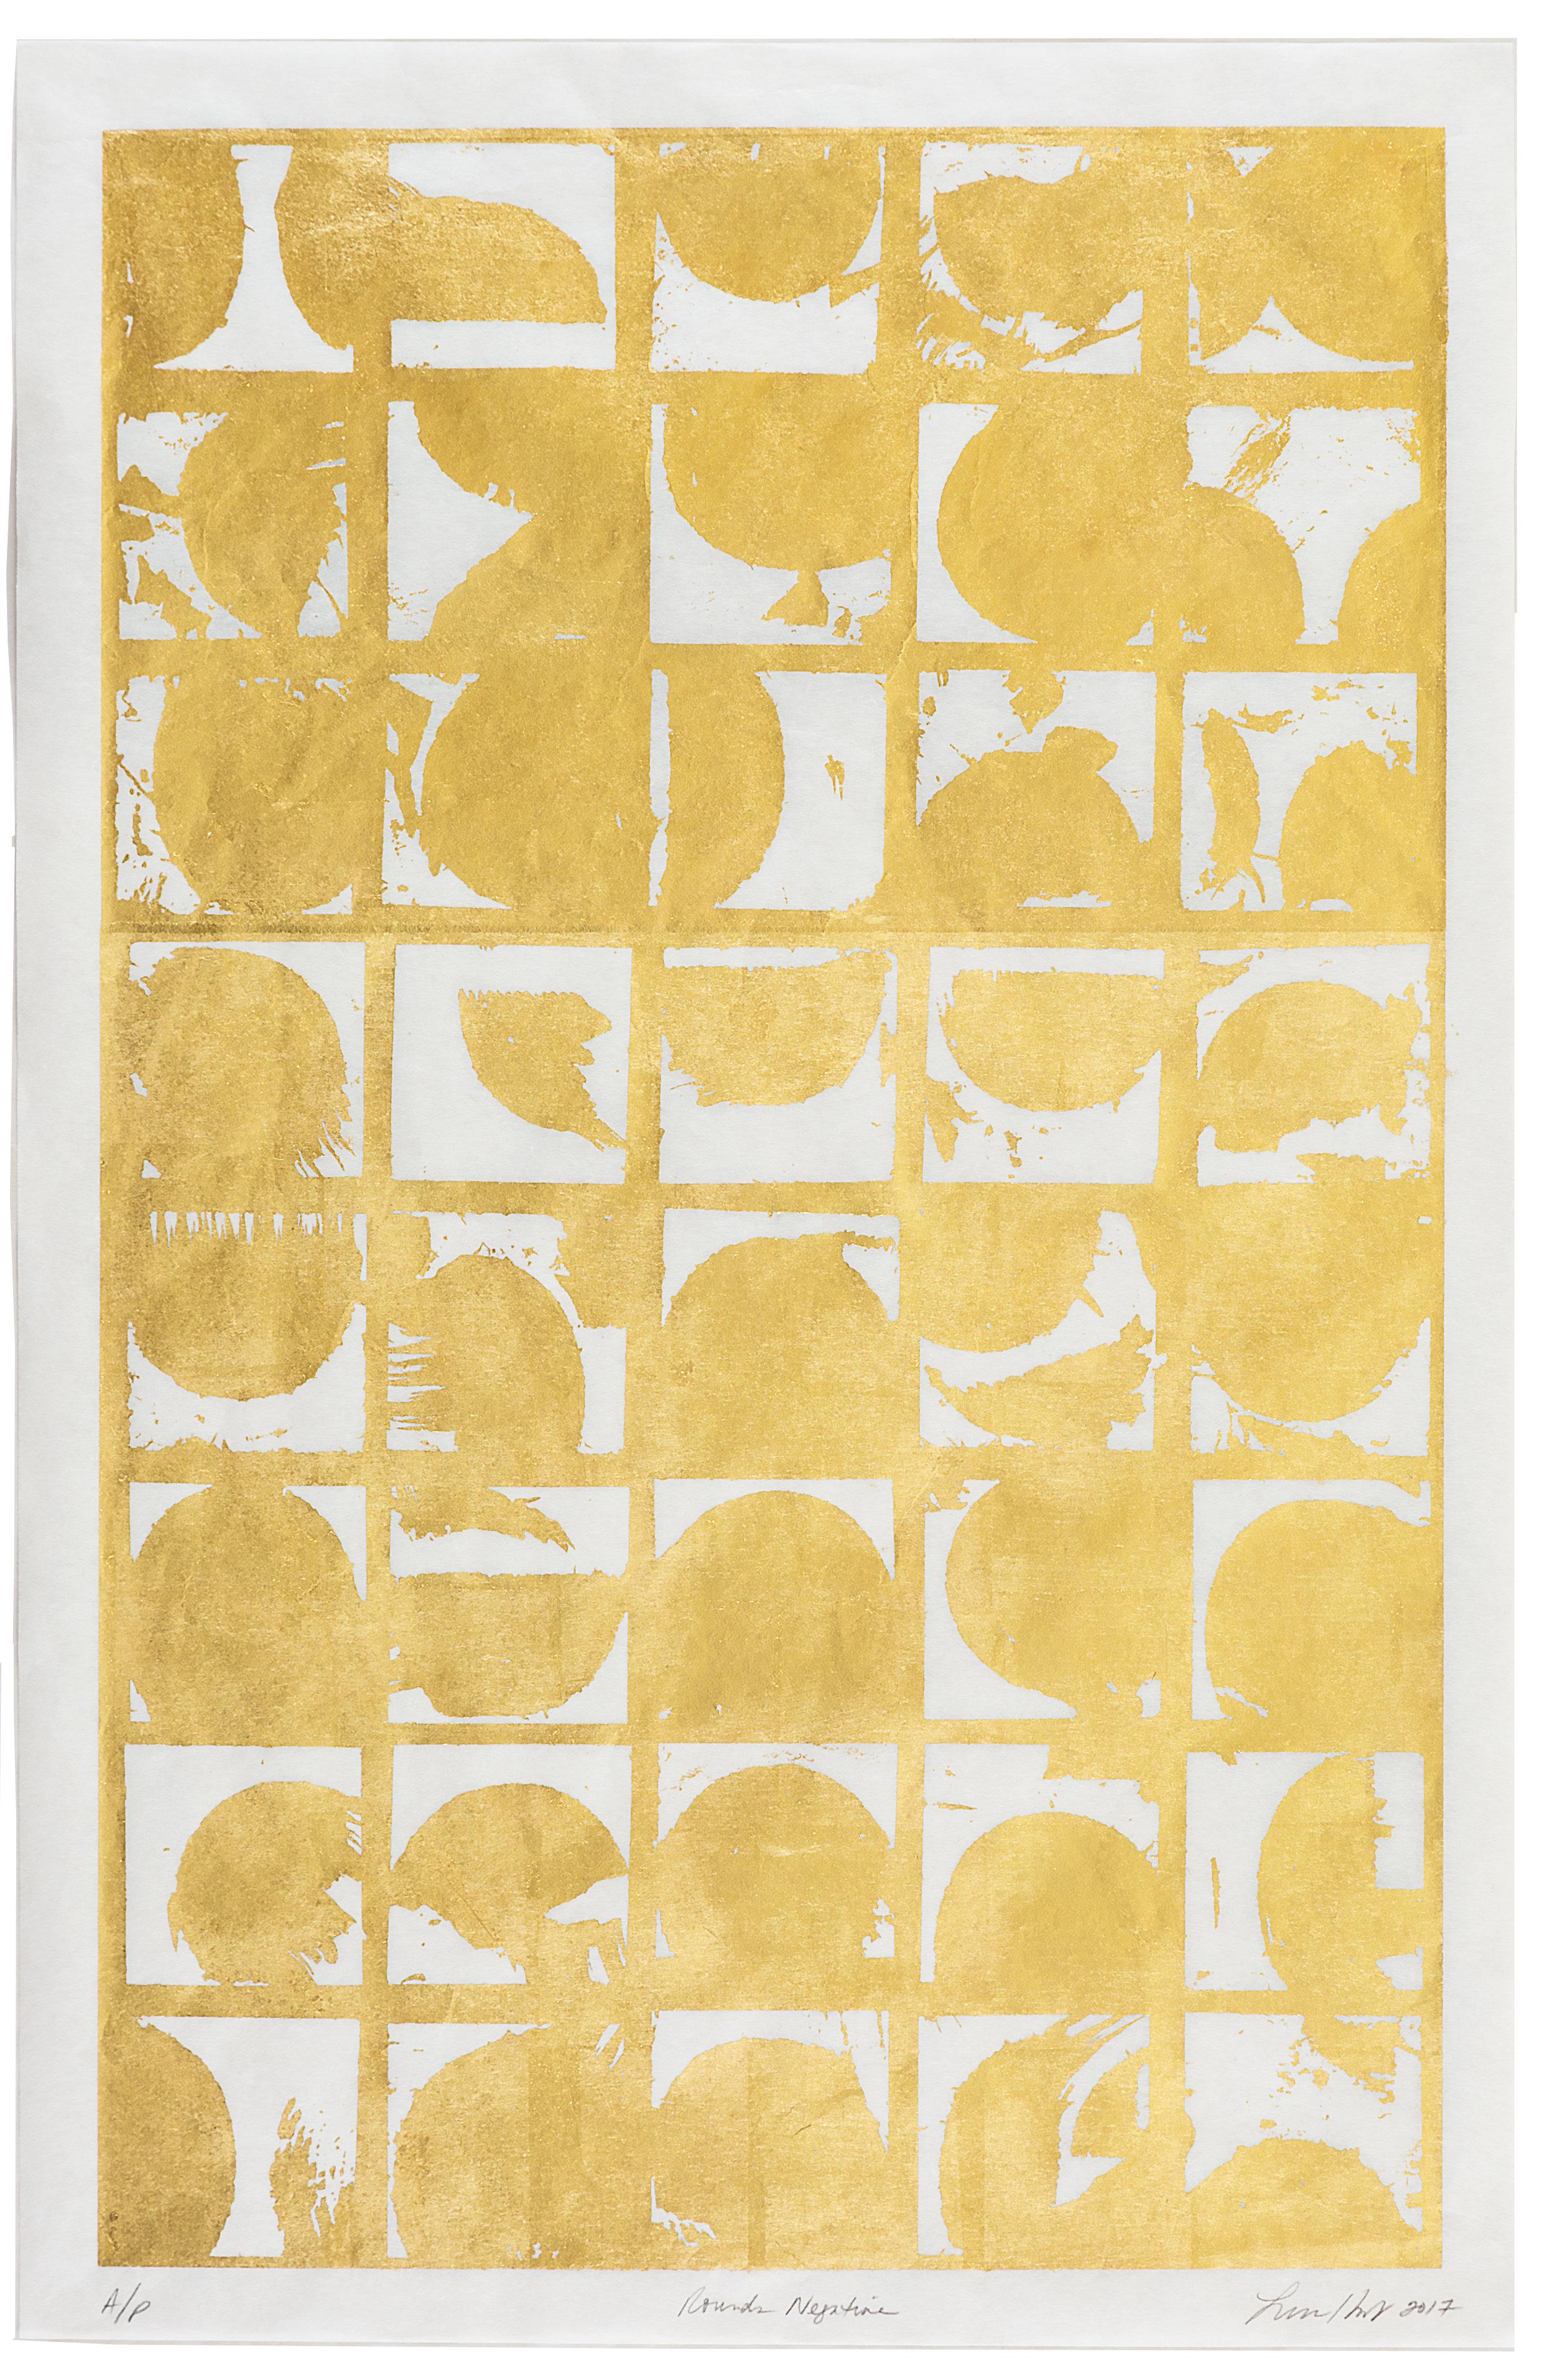 "Rounds Negative,   2017 Screen print. Limited edition 10. 24K gold leaf, Misu Rice Paper. 22"" x 32""  Inquire"